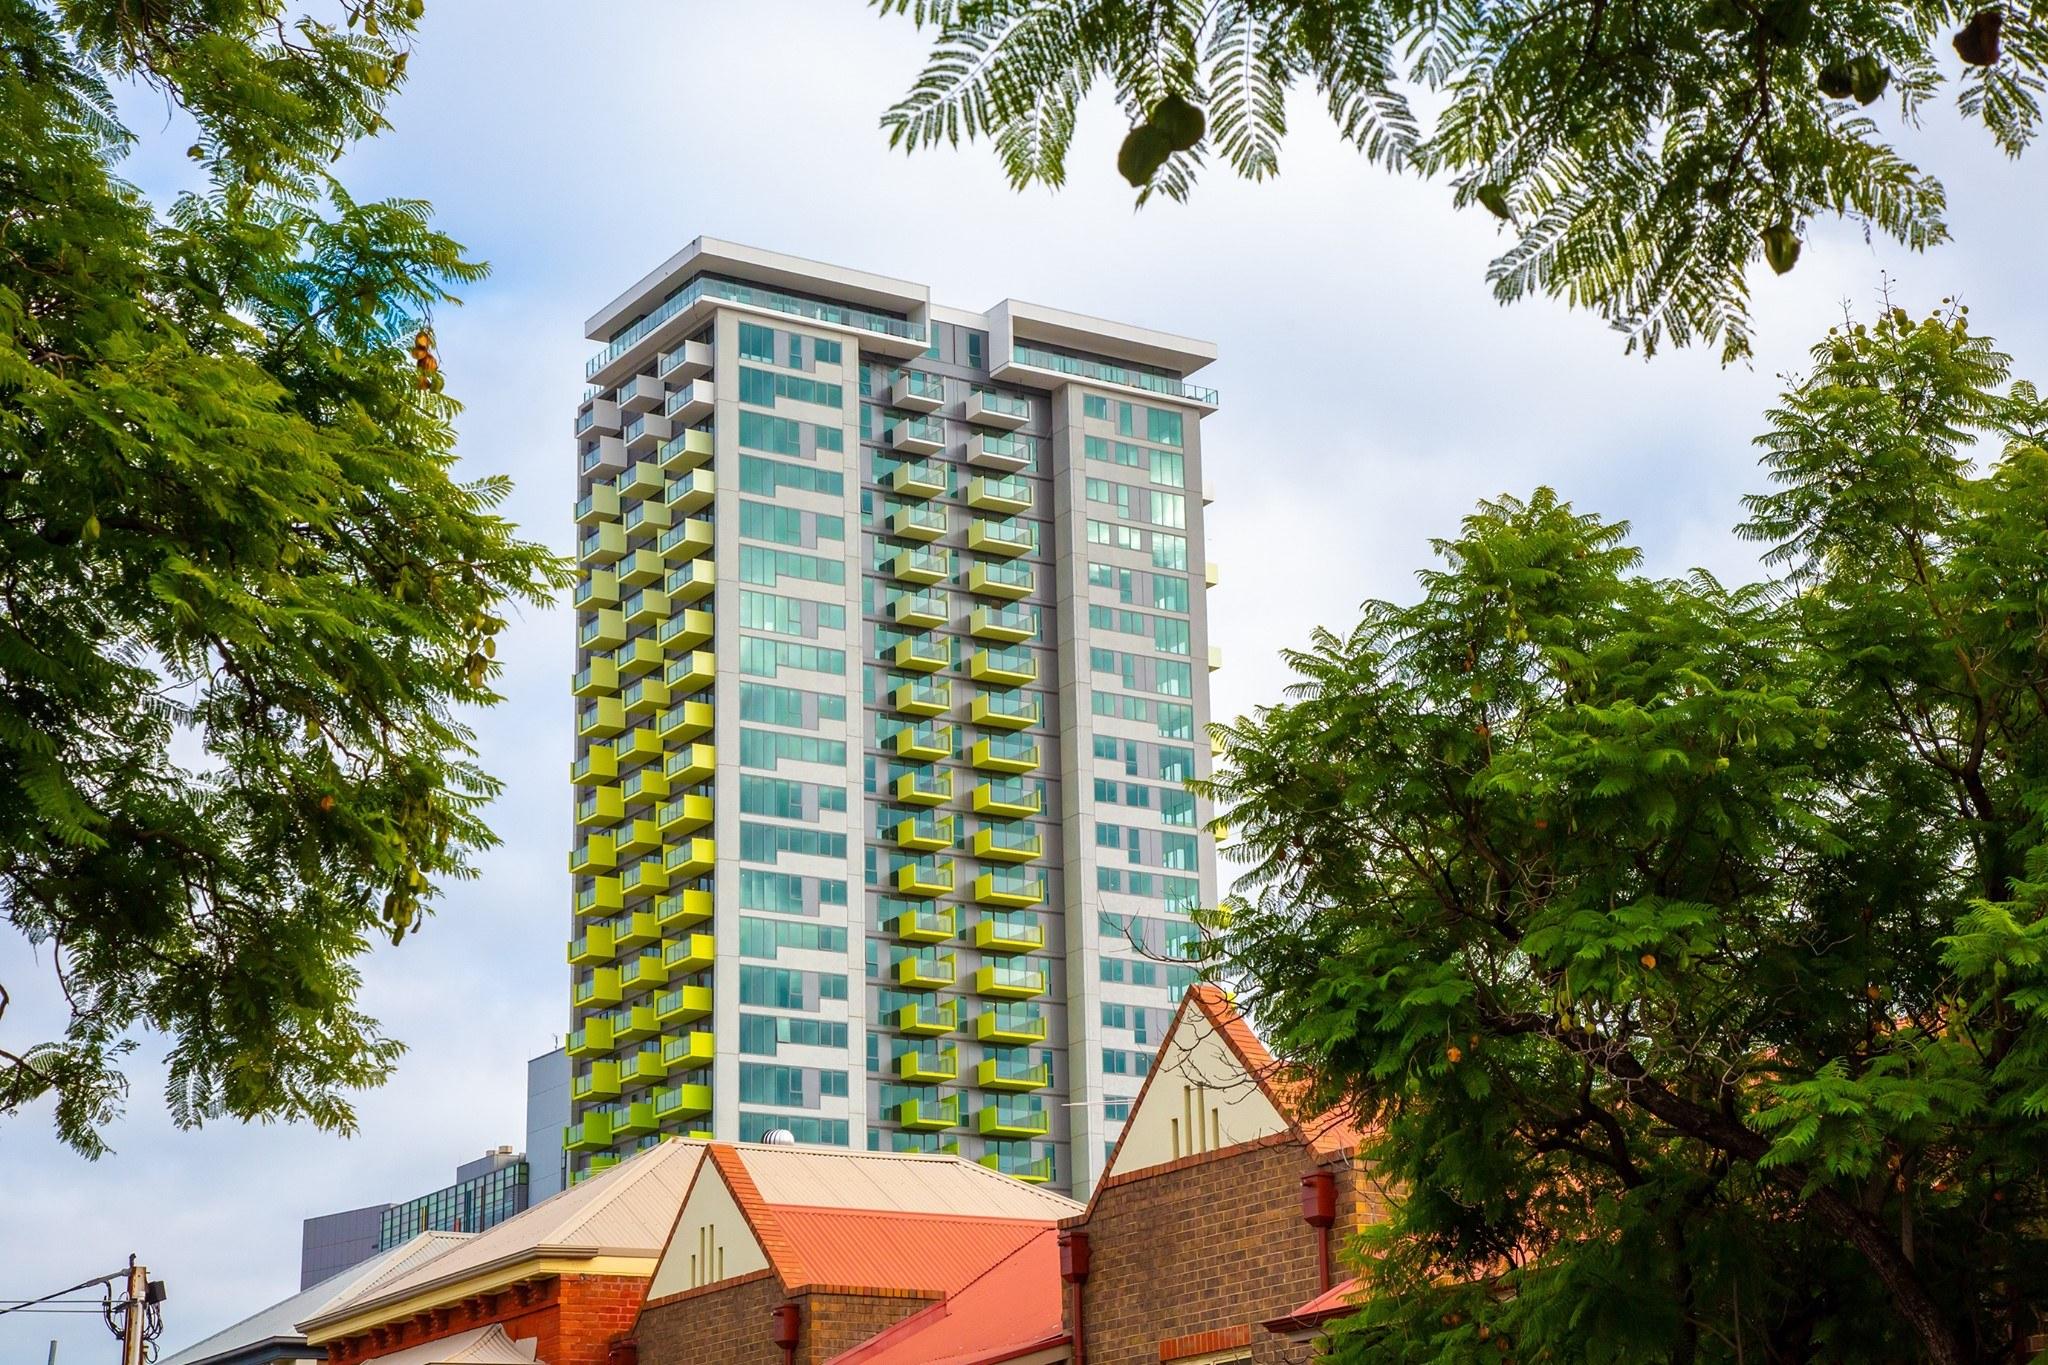 Kodo apartments exterior